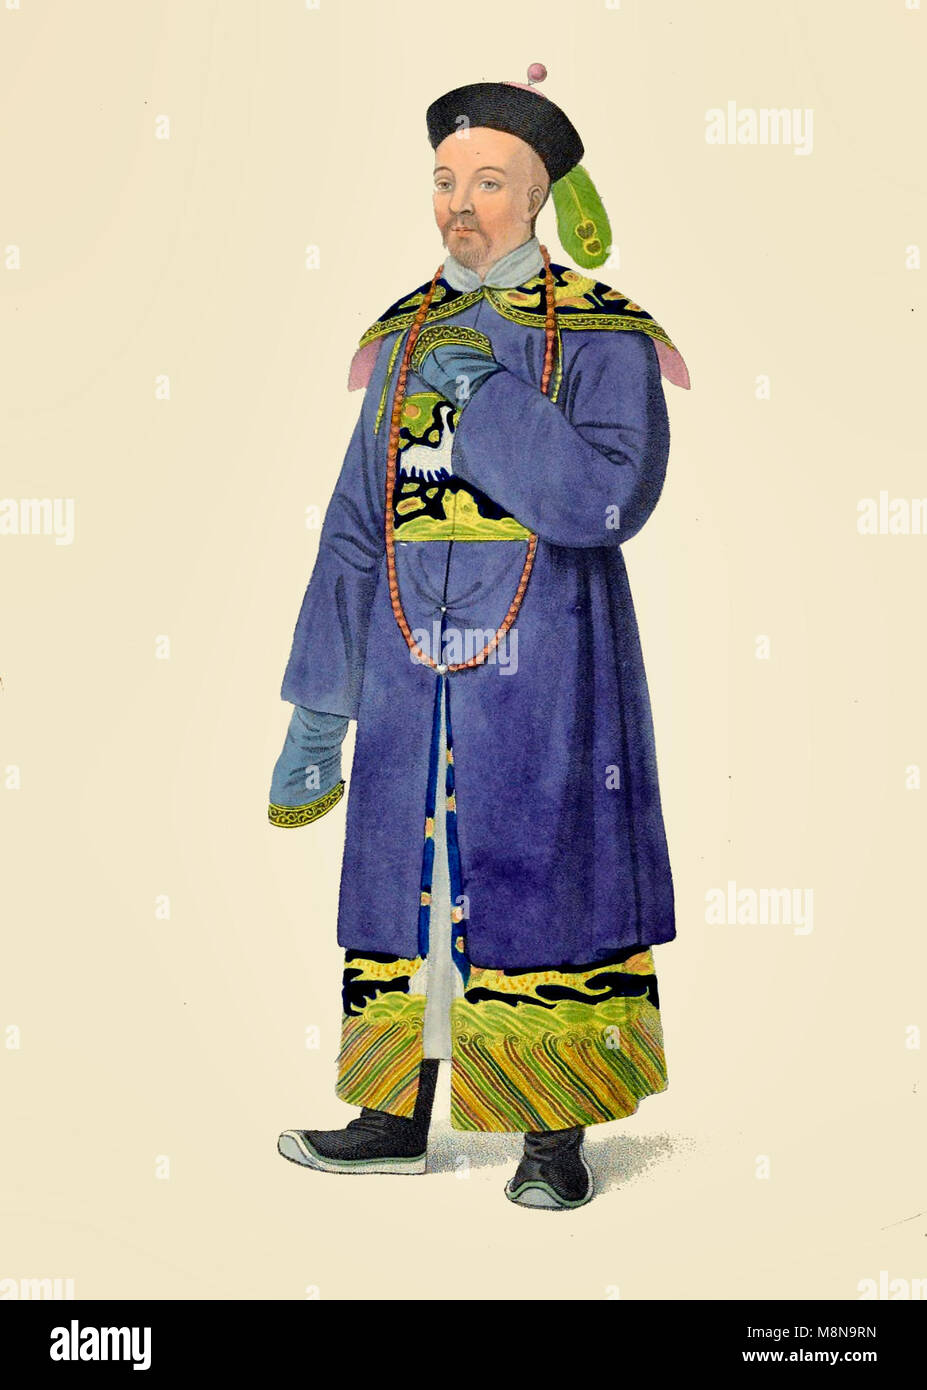 A Mandarin of Distinction, China, 1800 - Stock Image